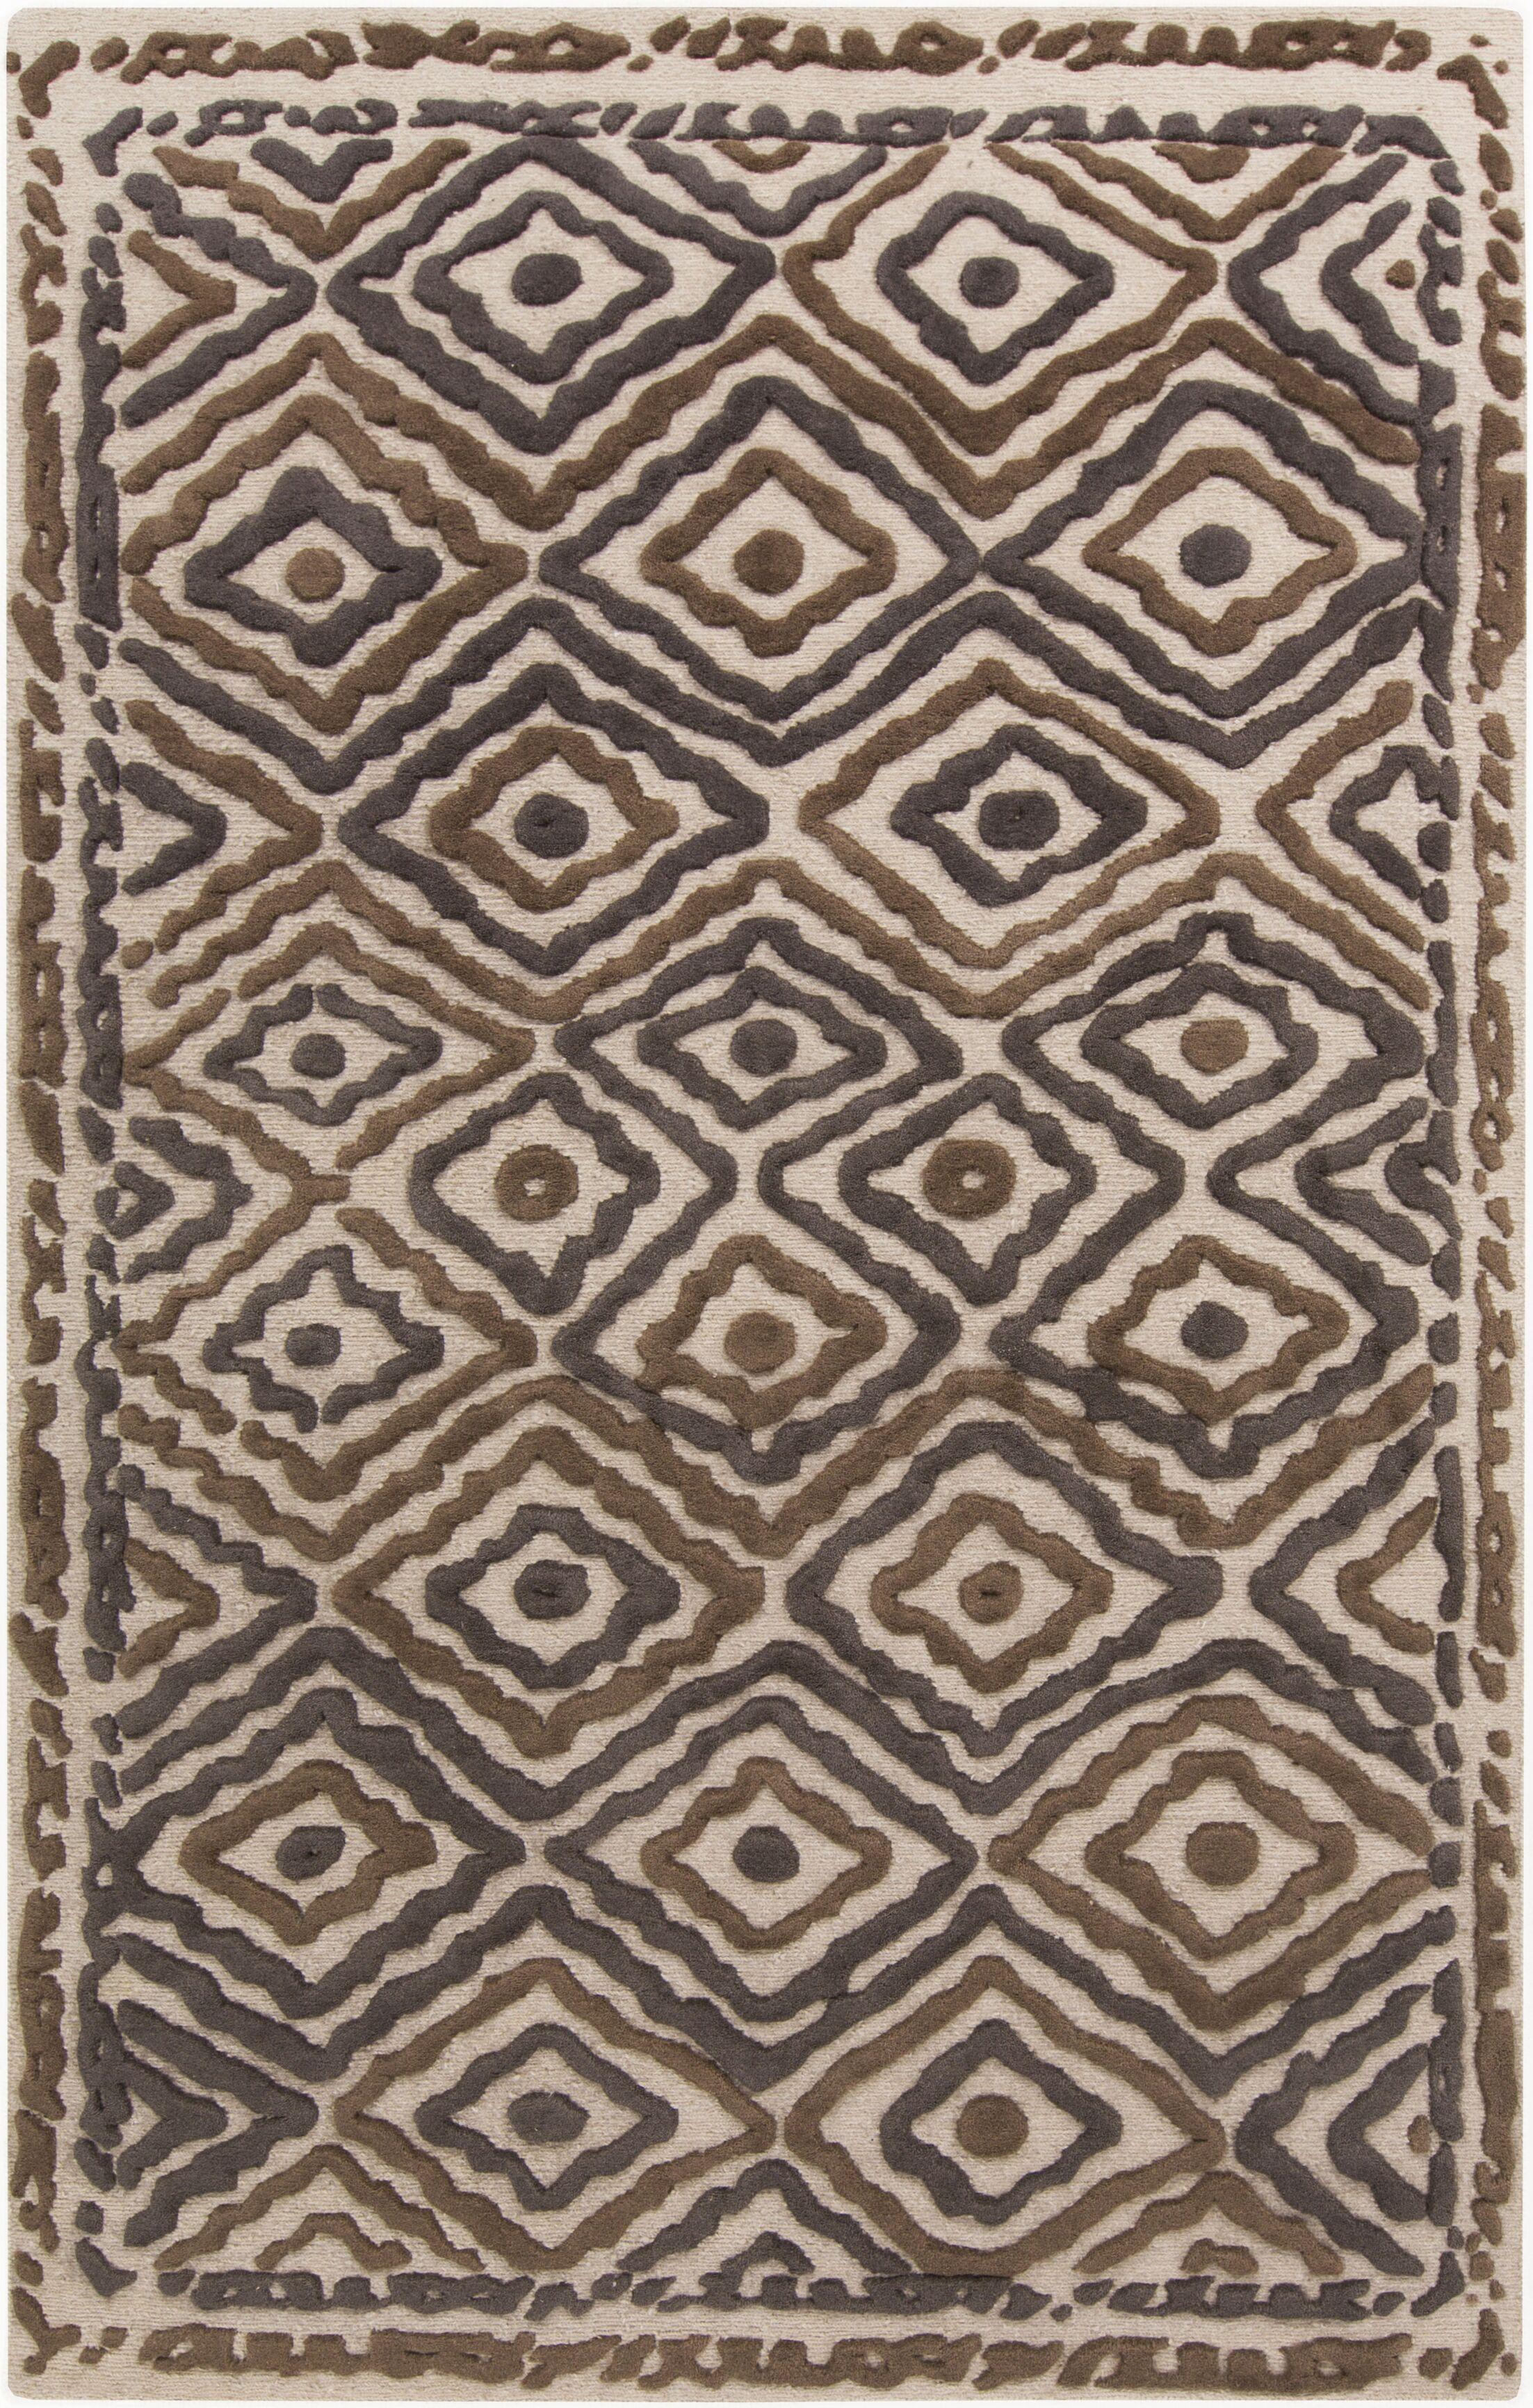 Sala Ivory Area Rug Rug Size: Rectangle 8' x 11'